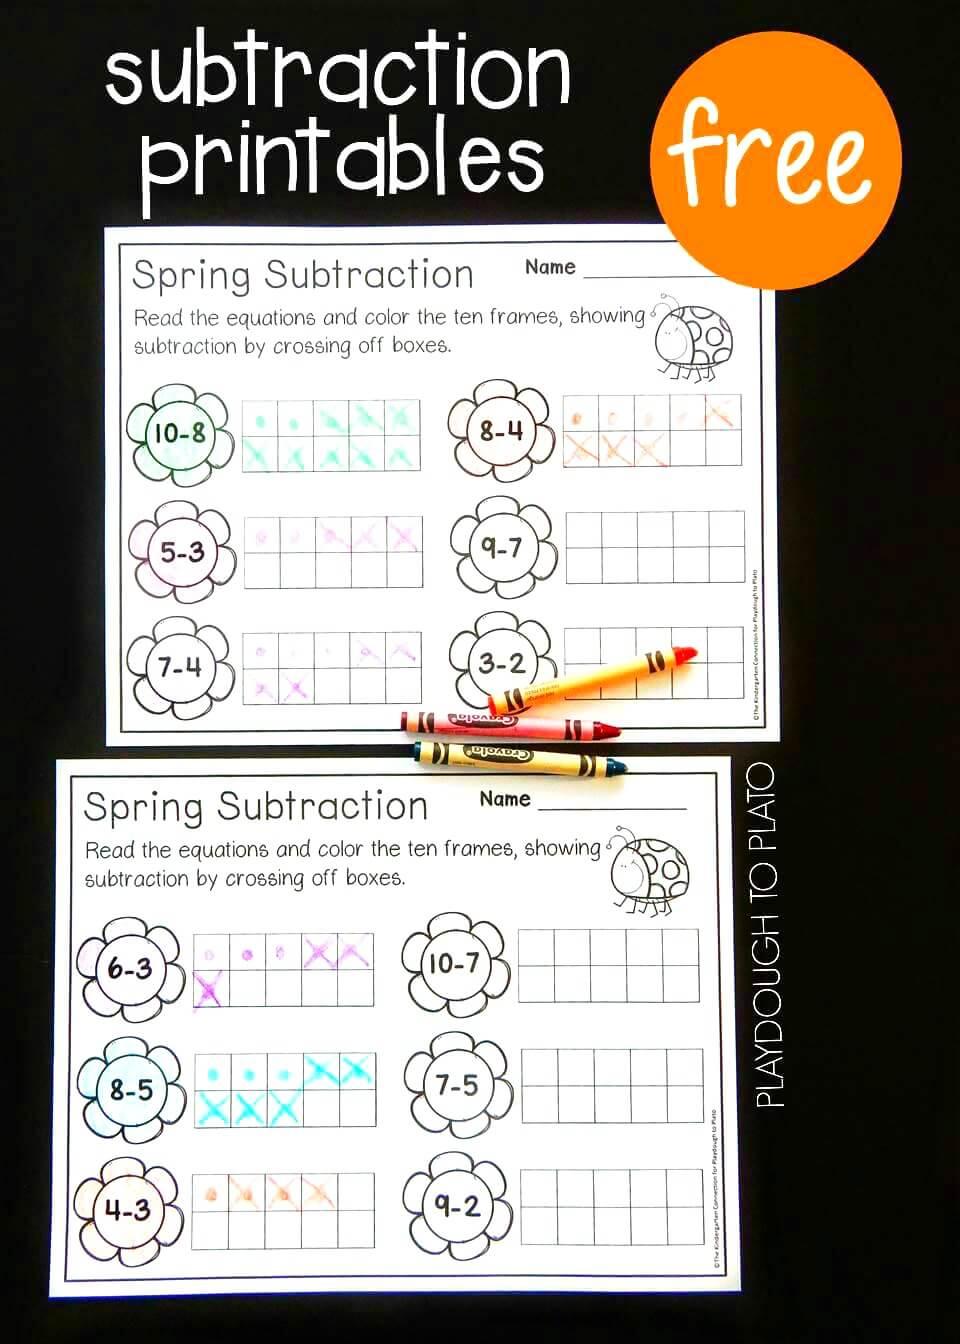 photo regarding Printable Tens Frames identify Spring 10 Body Subtraction - Playdough Towards Plato